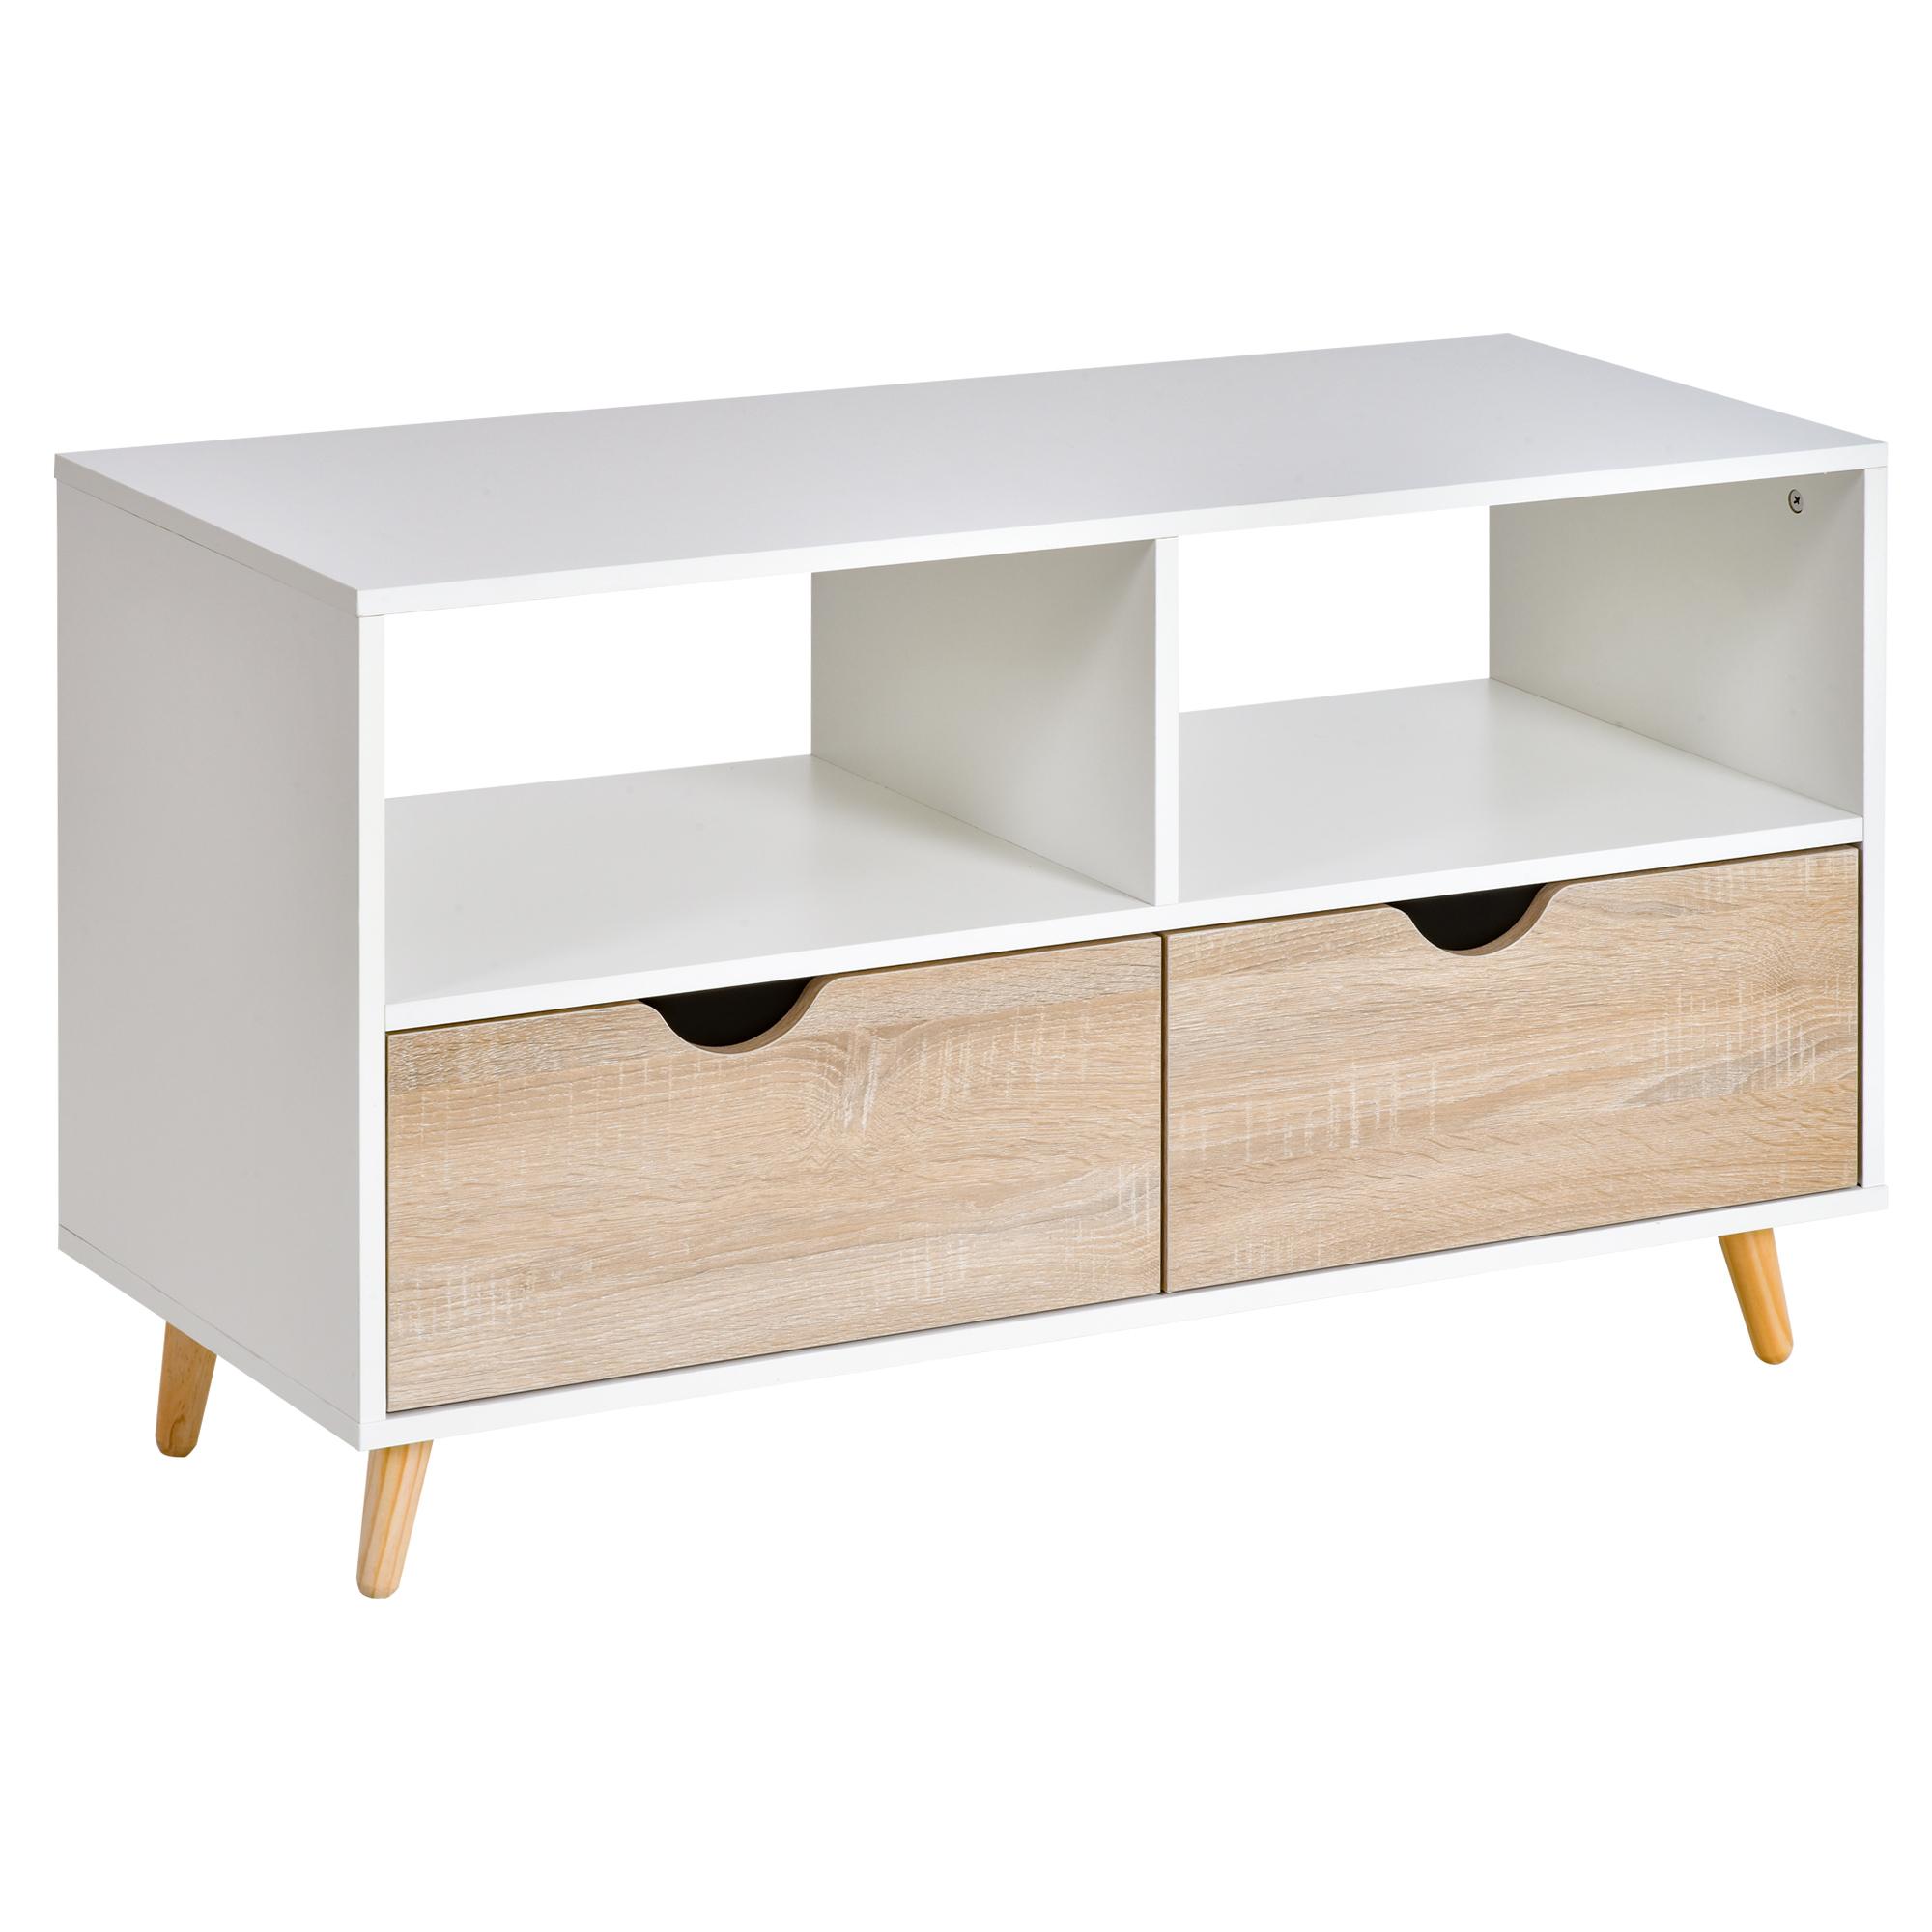 Meuble TV bas sur pieds style scandinave 2 tiroirs chêne clair blanc